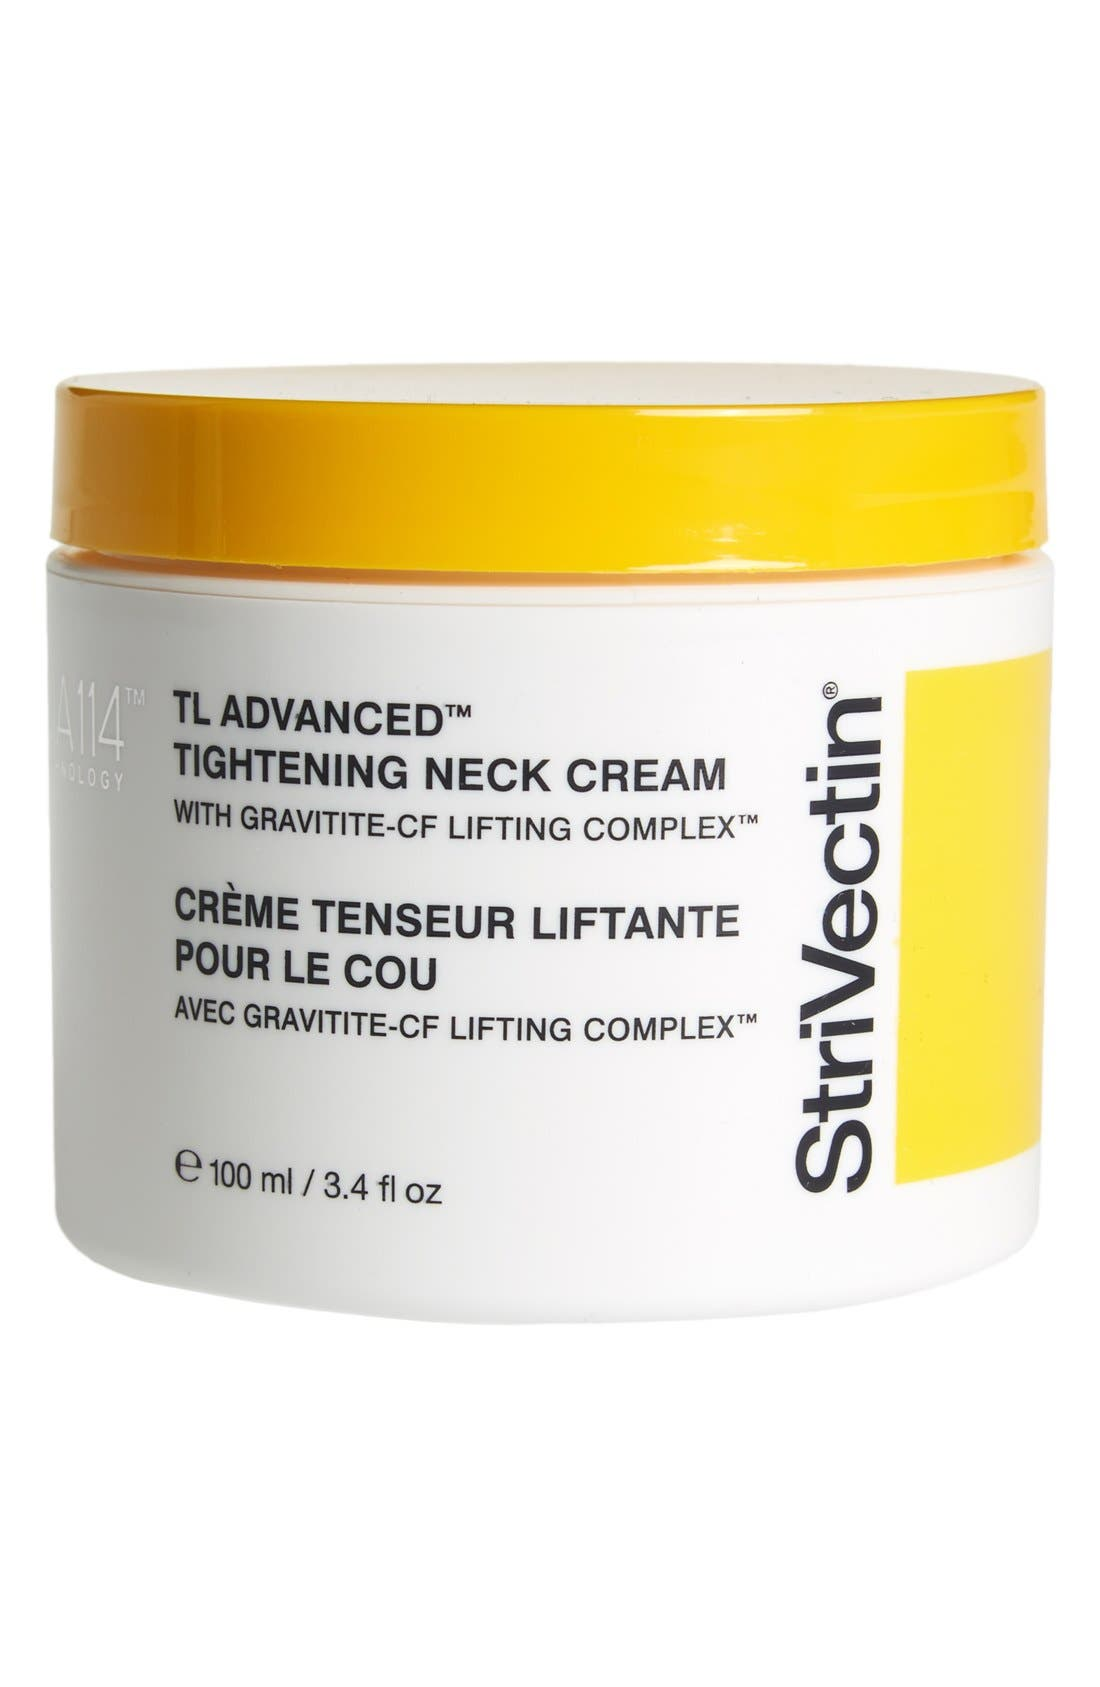 StriVectin®-TL™ 'The Big Deal' Jumbo Advanced Tightening Neck Cream ($189 Value)